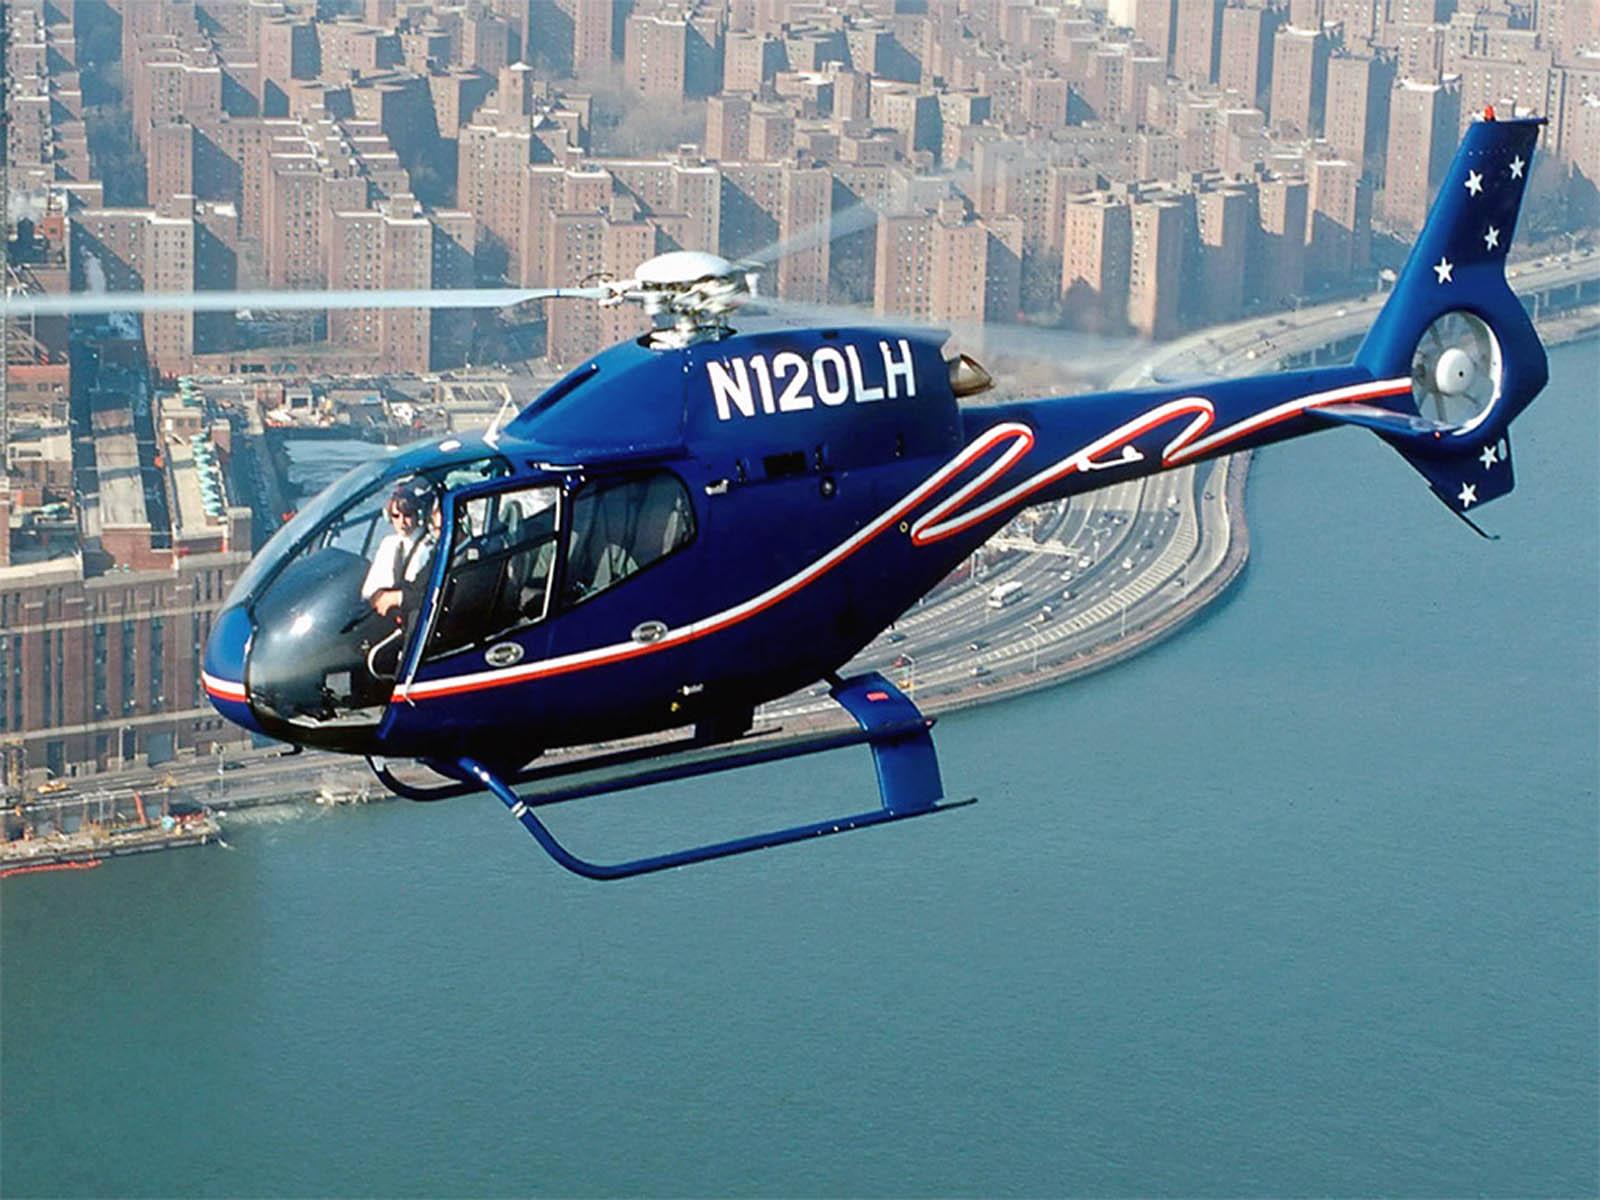 http://4.bp.blogspot.com/-5lxzoKb-LxE/UDHmeGPZOHI/AAAAAAAAHrw/C00DjtVWtro/s1600/Eurocopter+EC+120+Wallpapers+6.jpg